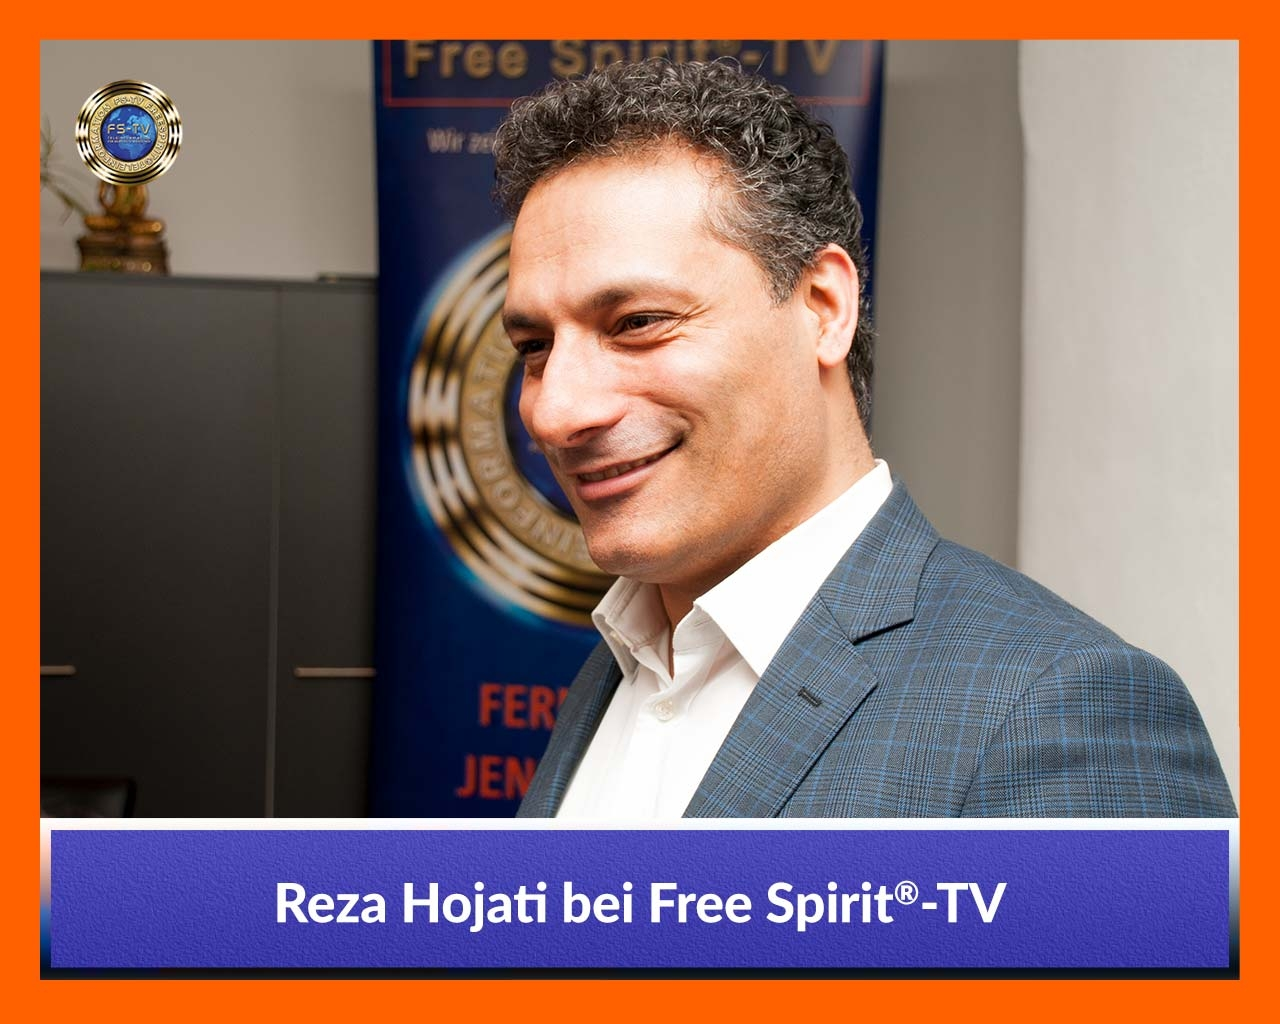 Reza-Hojati-10